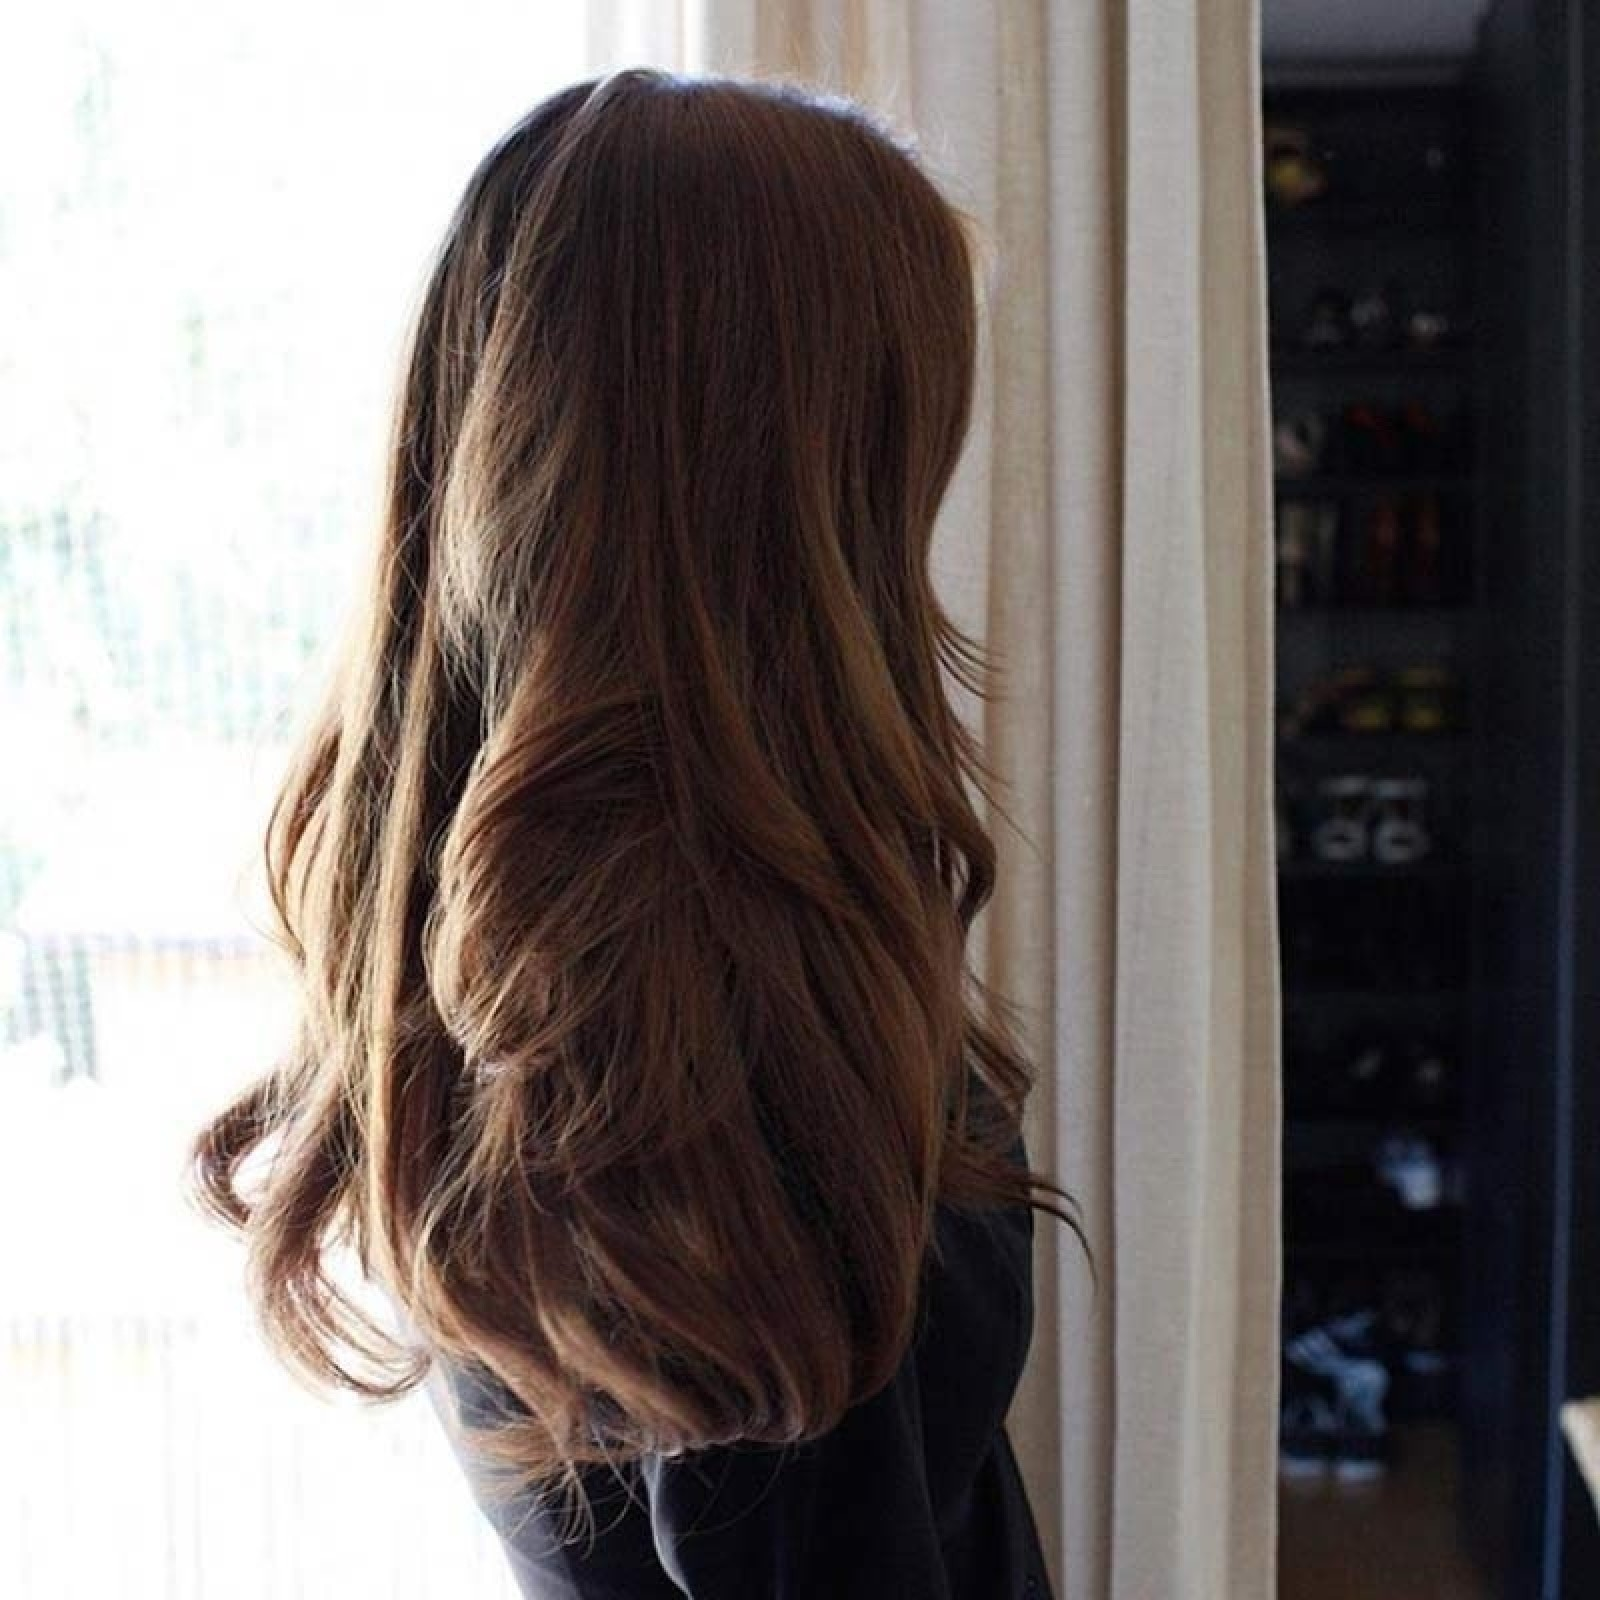 Clip extensions dickes haar